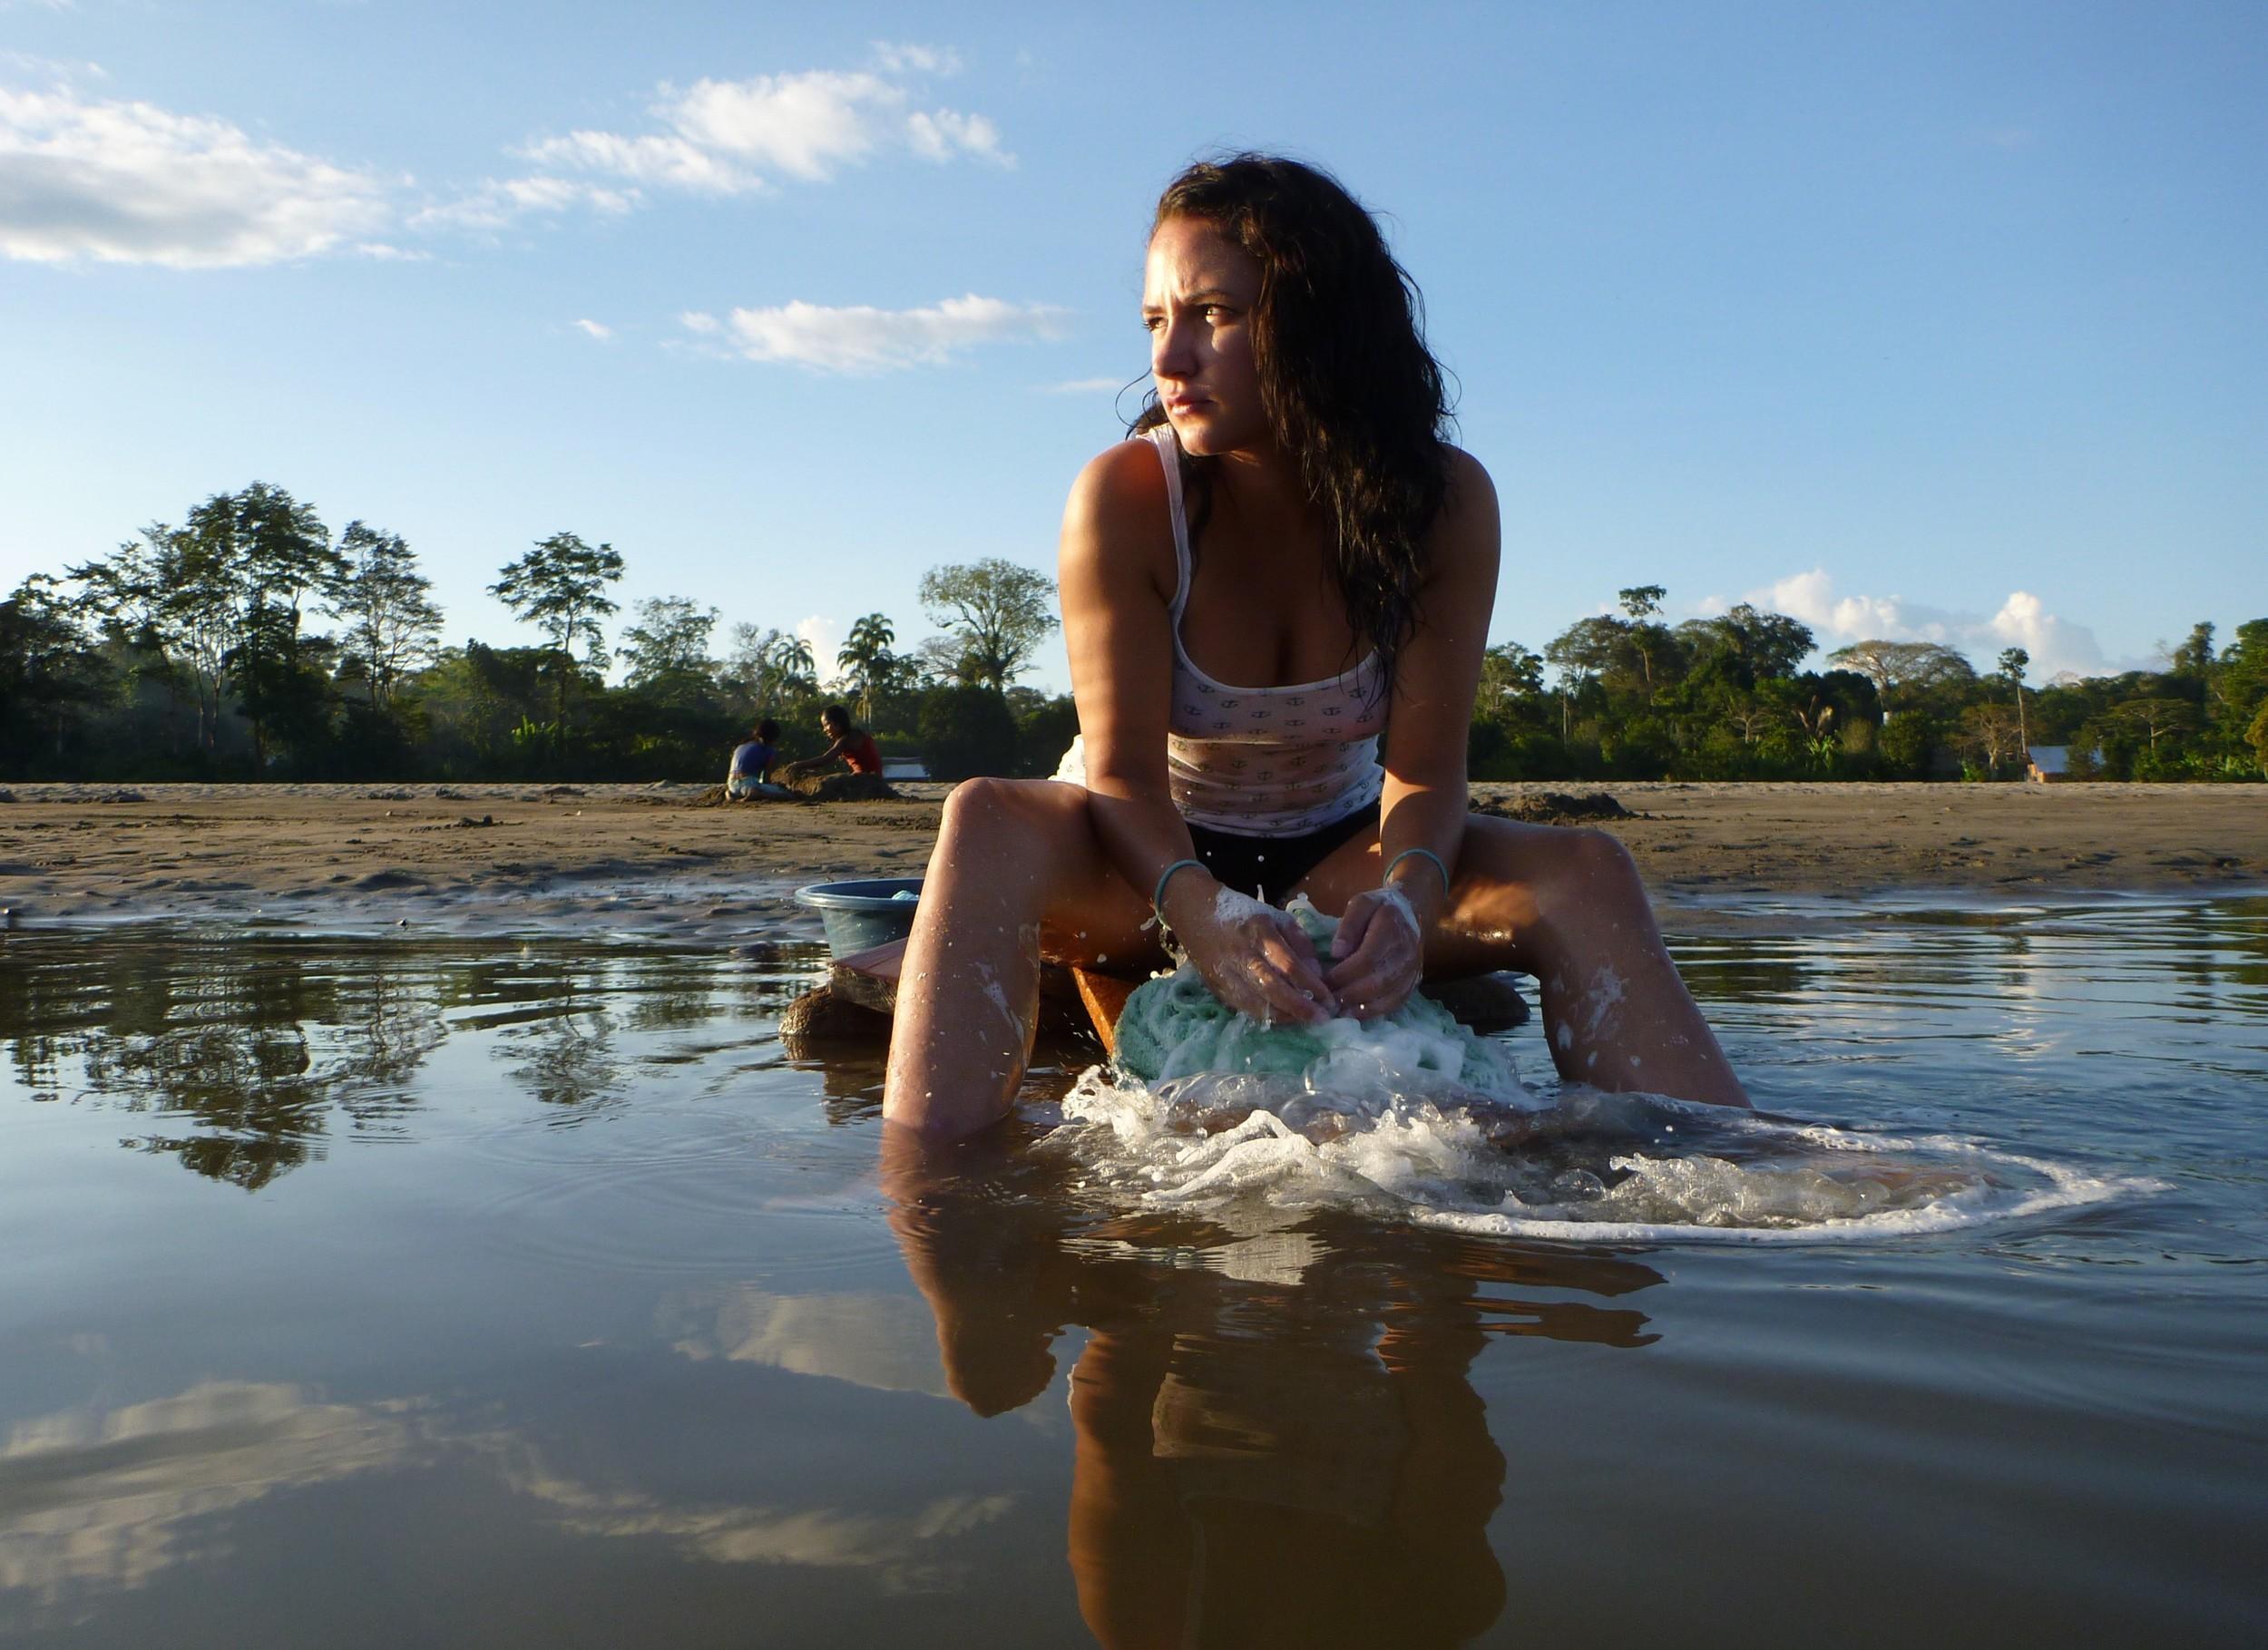 Sadie washing clothes in river - smaller.jpg